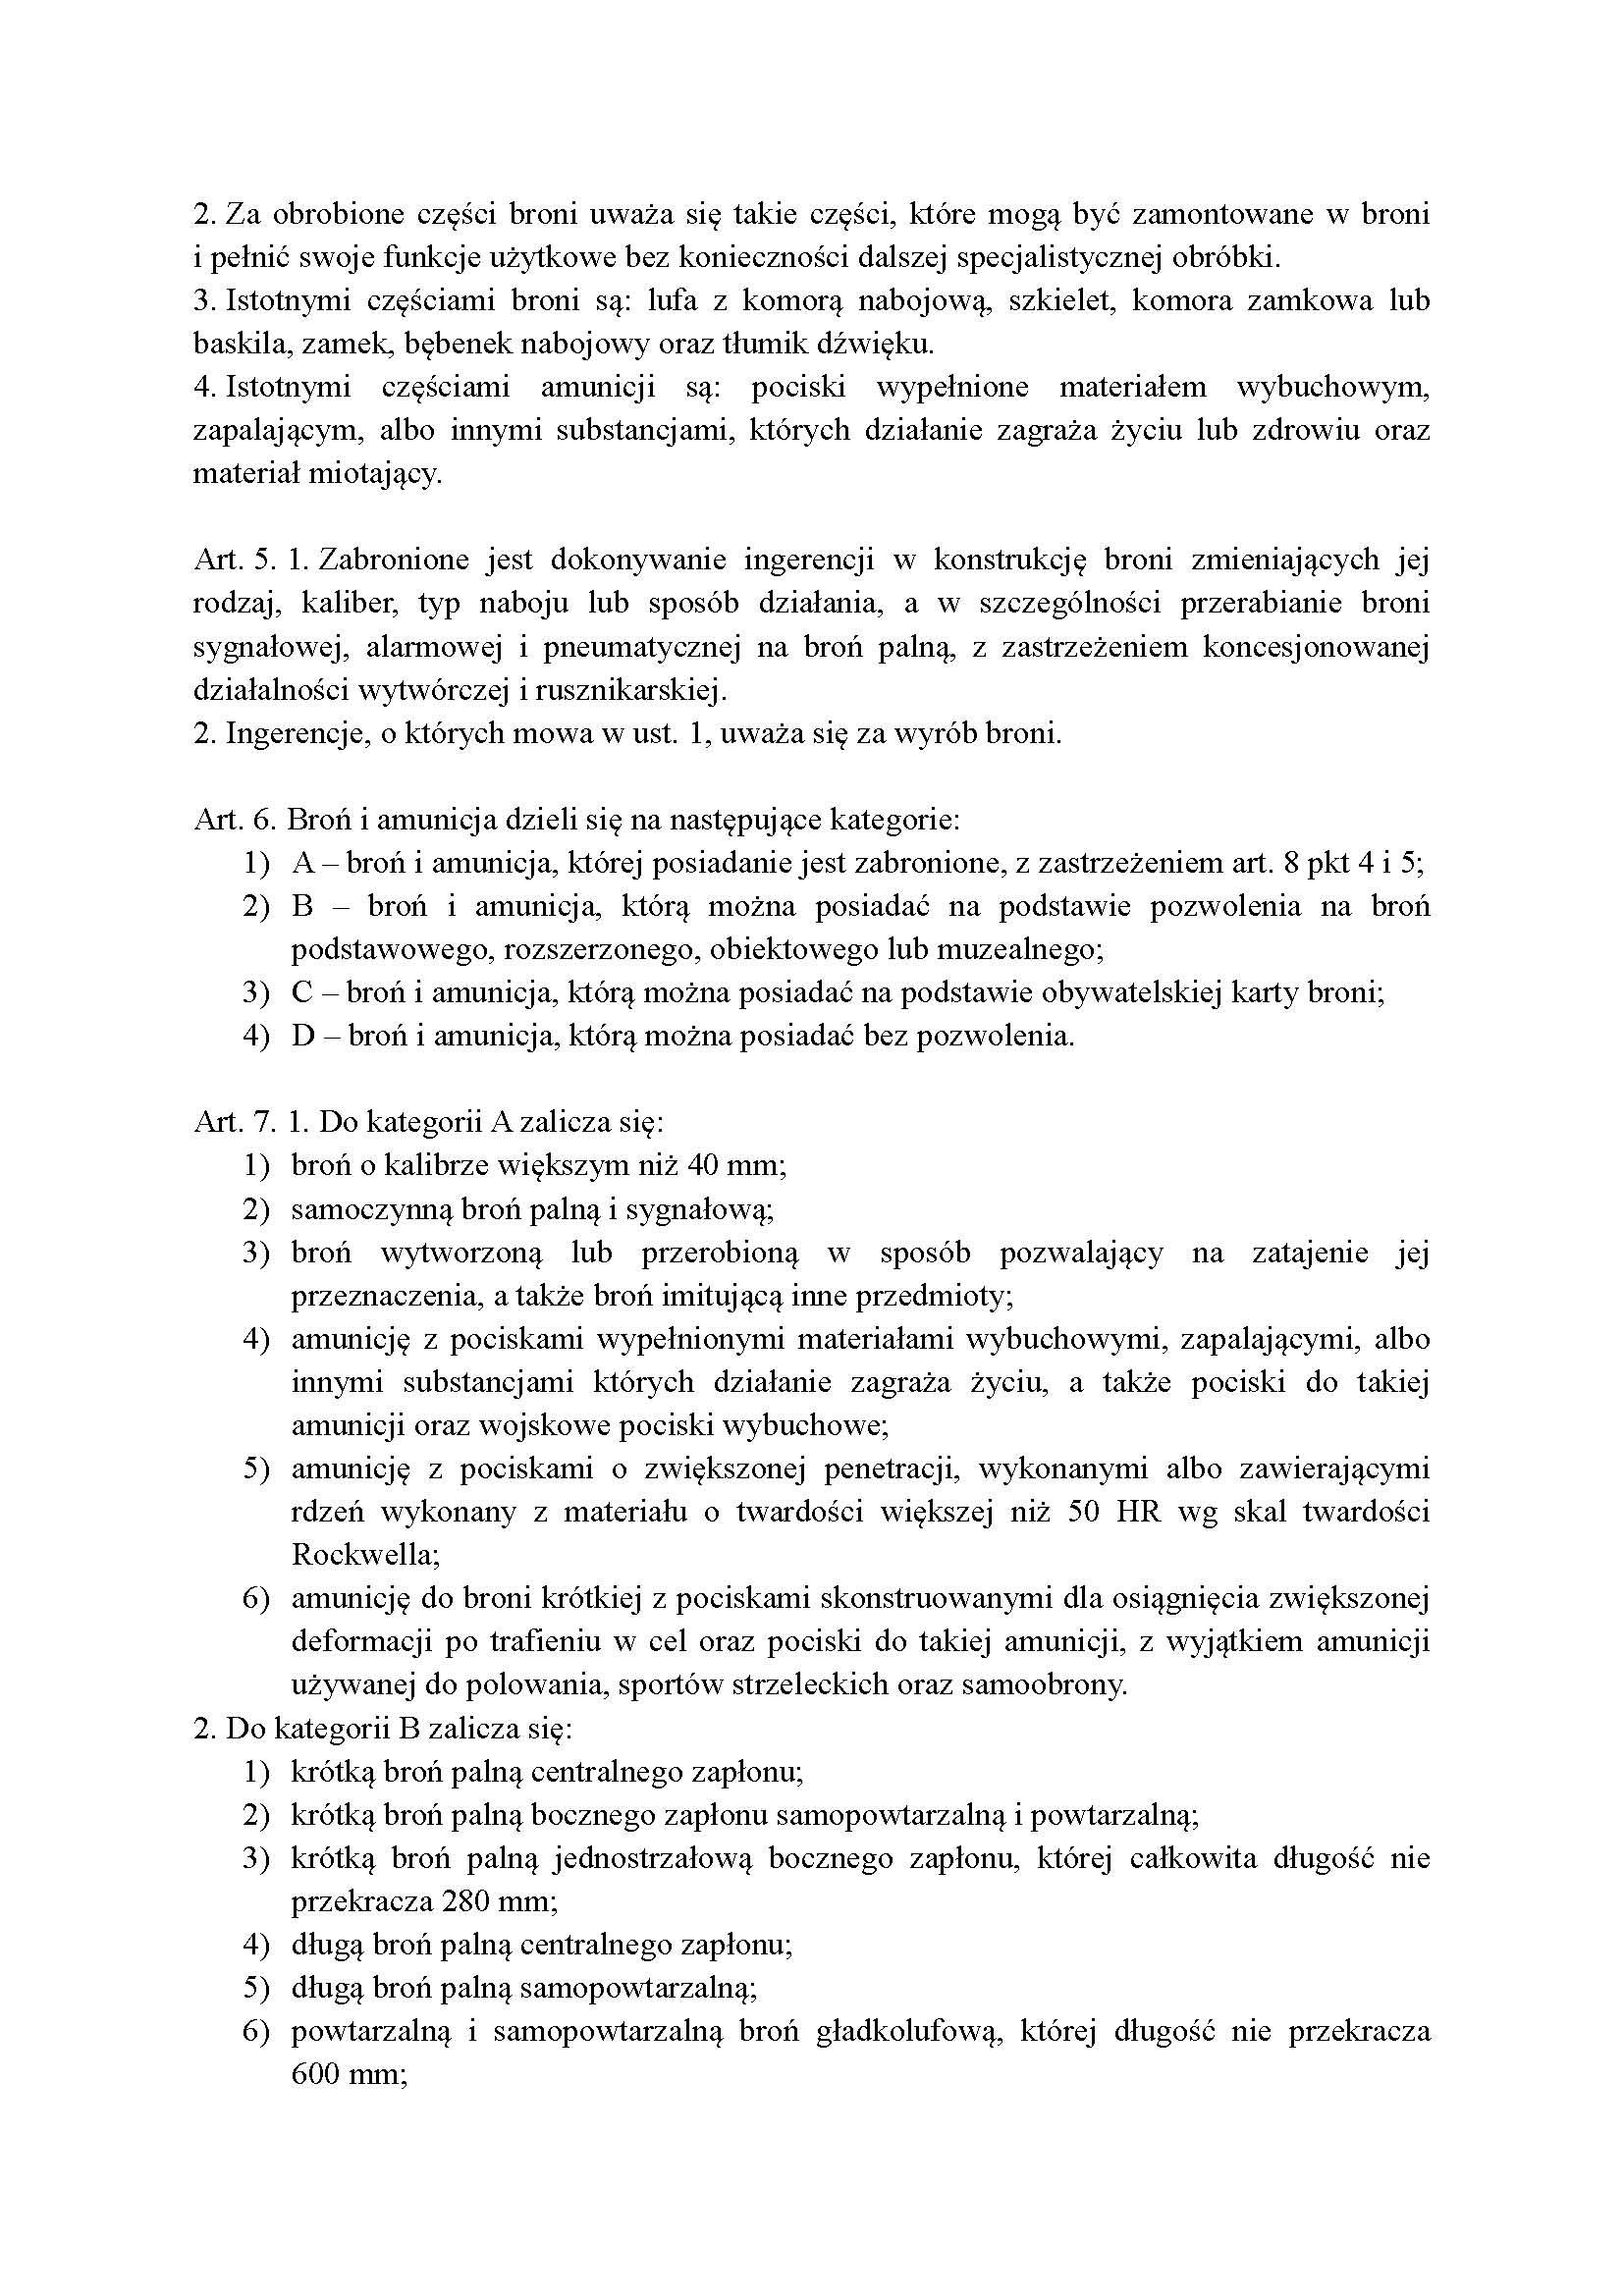 FRSwP_projekt_ustawy_20151125_Strona_04